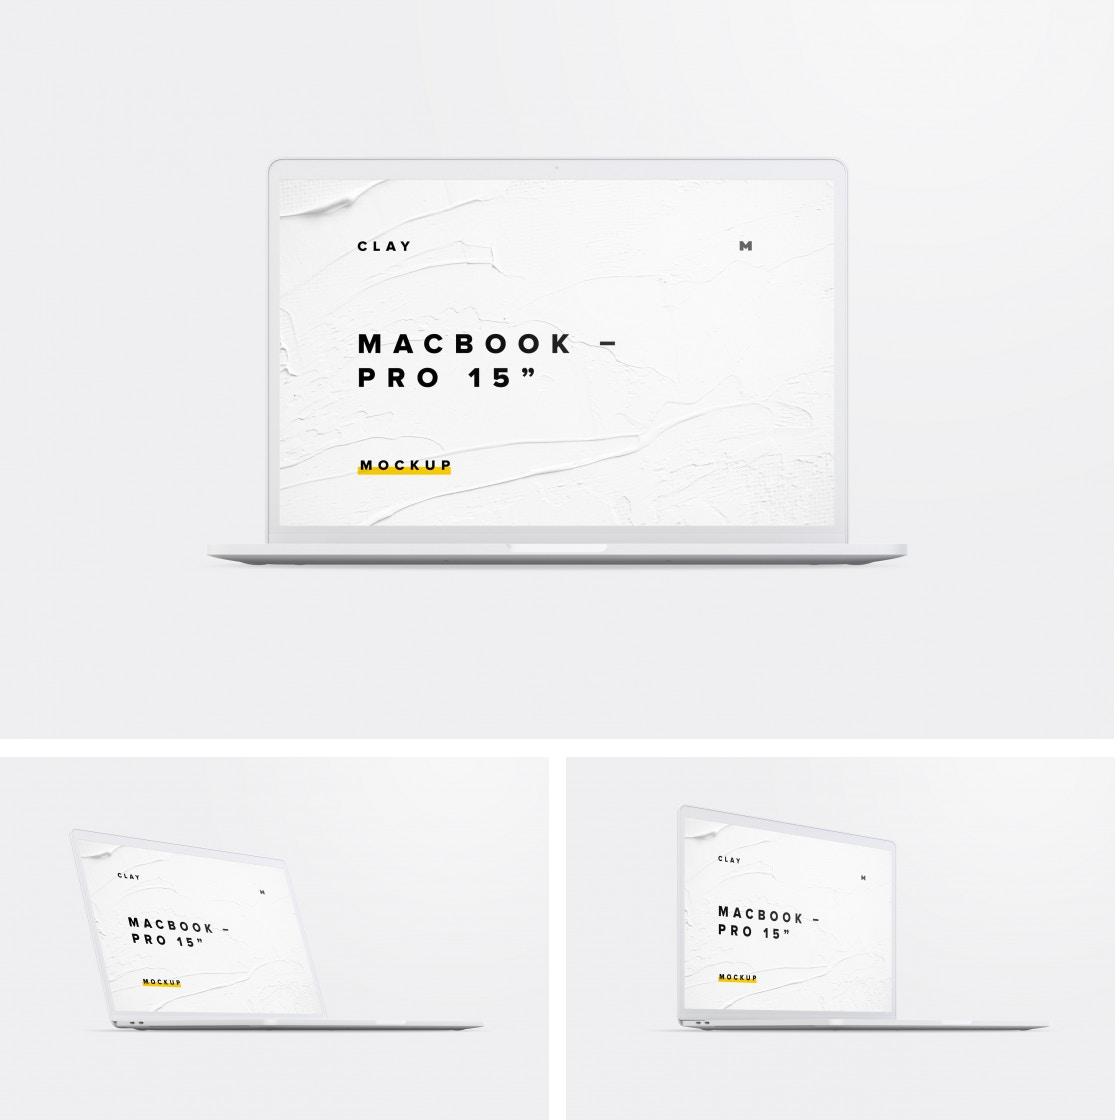 Clay MacBook Pro 15 Mockups Poster